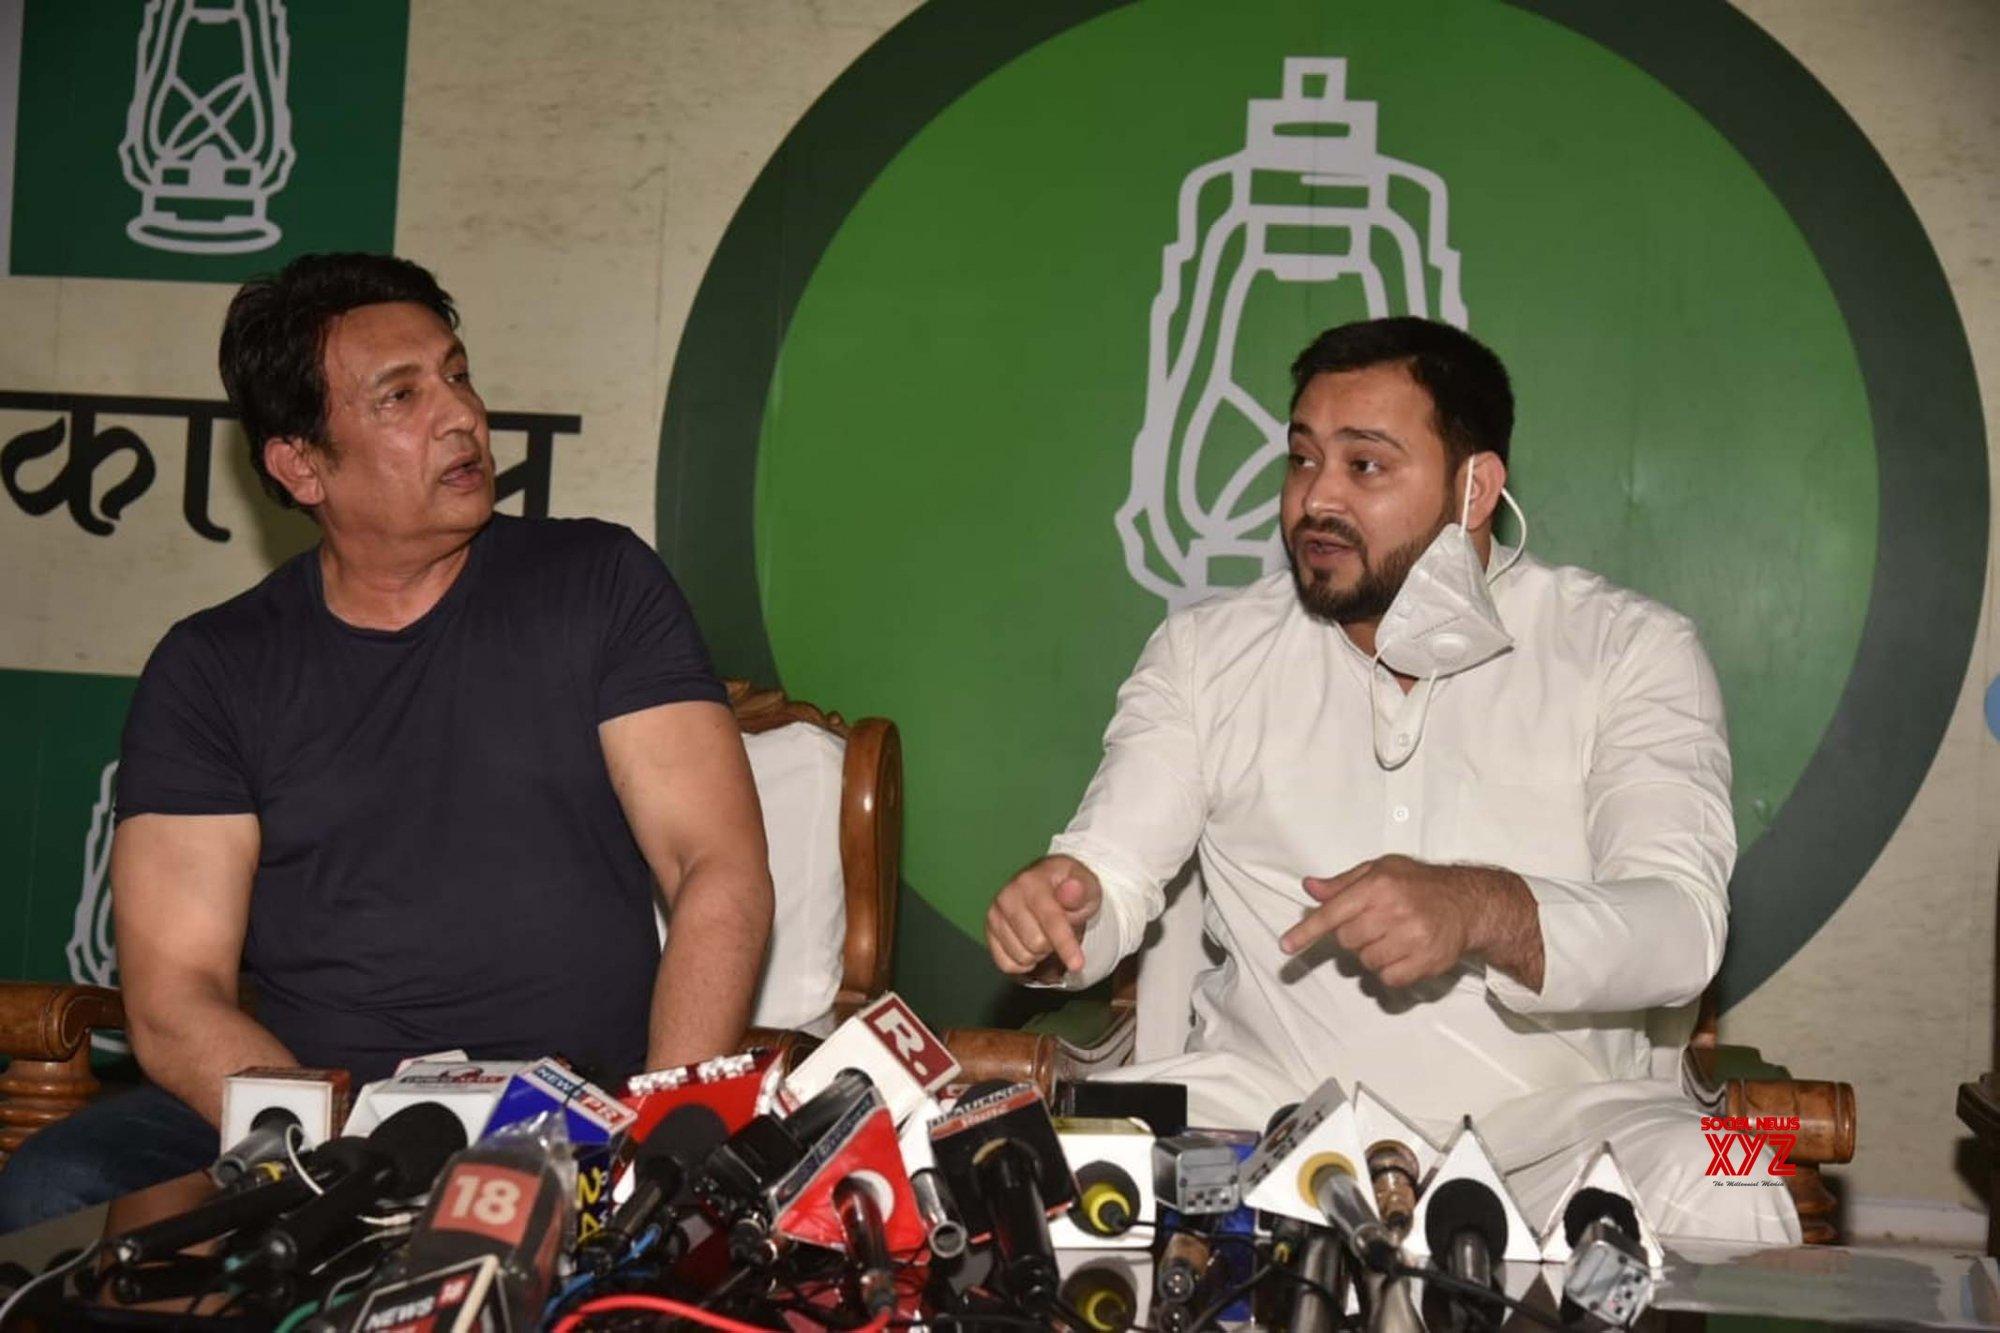 Patna: Shekhar Suman, Tejashwi Yadav's press conference #Gallery